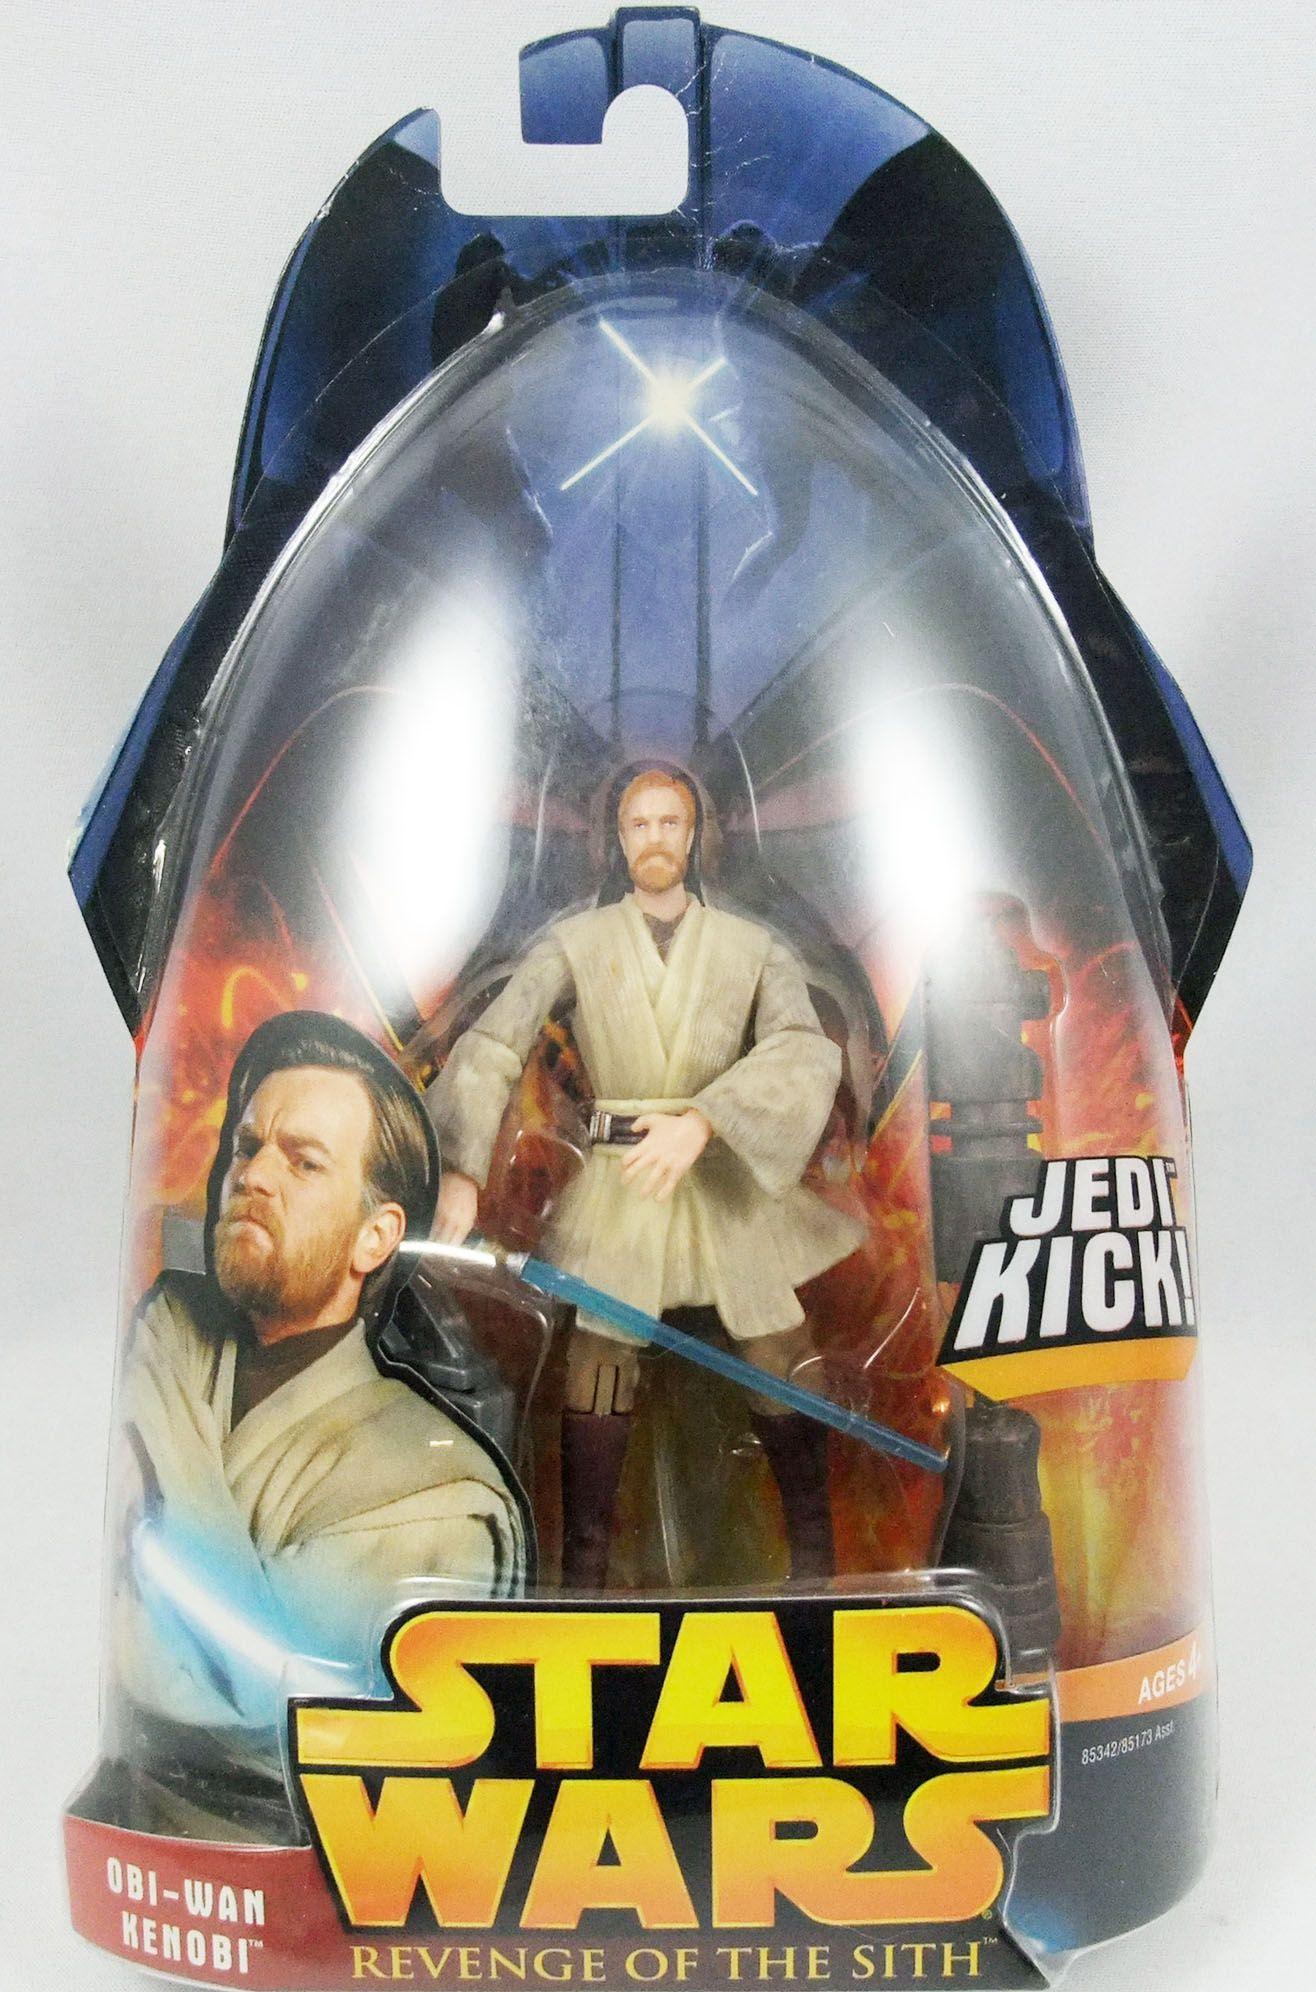 Star Wars Episode Iii Revenge Of The Sith Hasbro Obi Wan Kenobi Jedi Kick 27